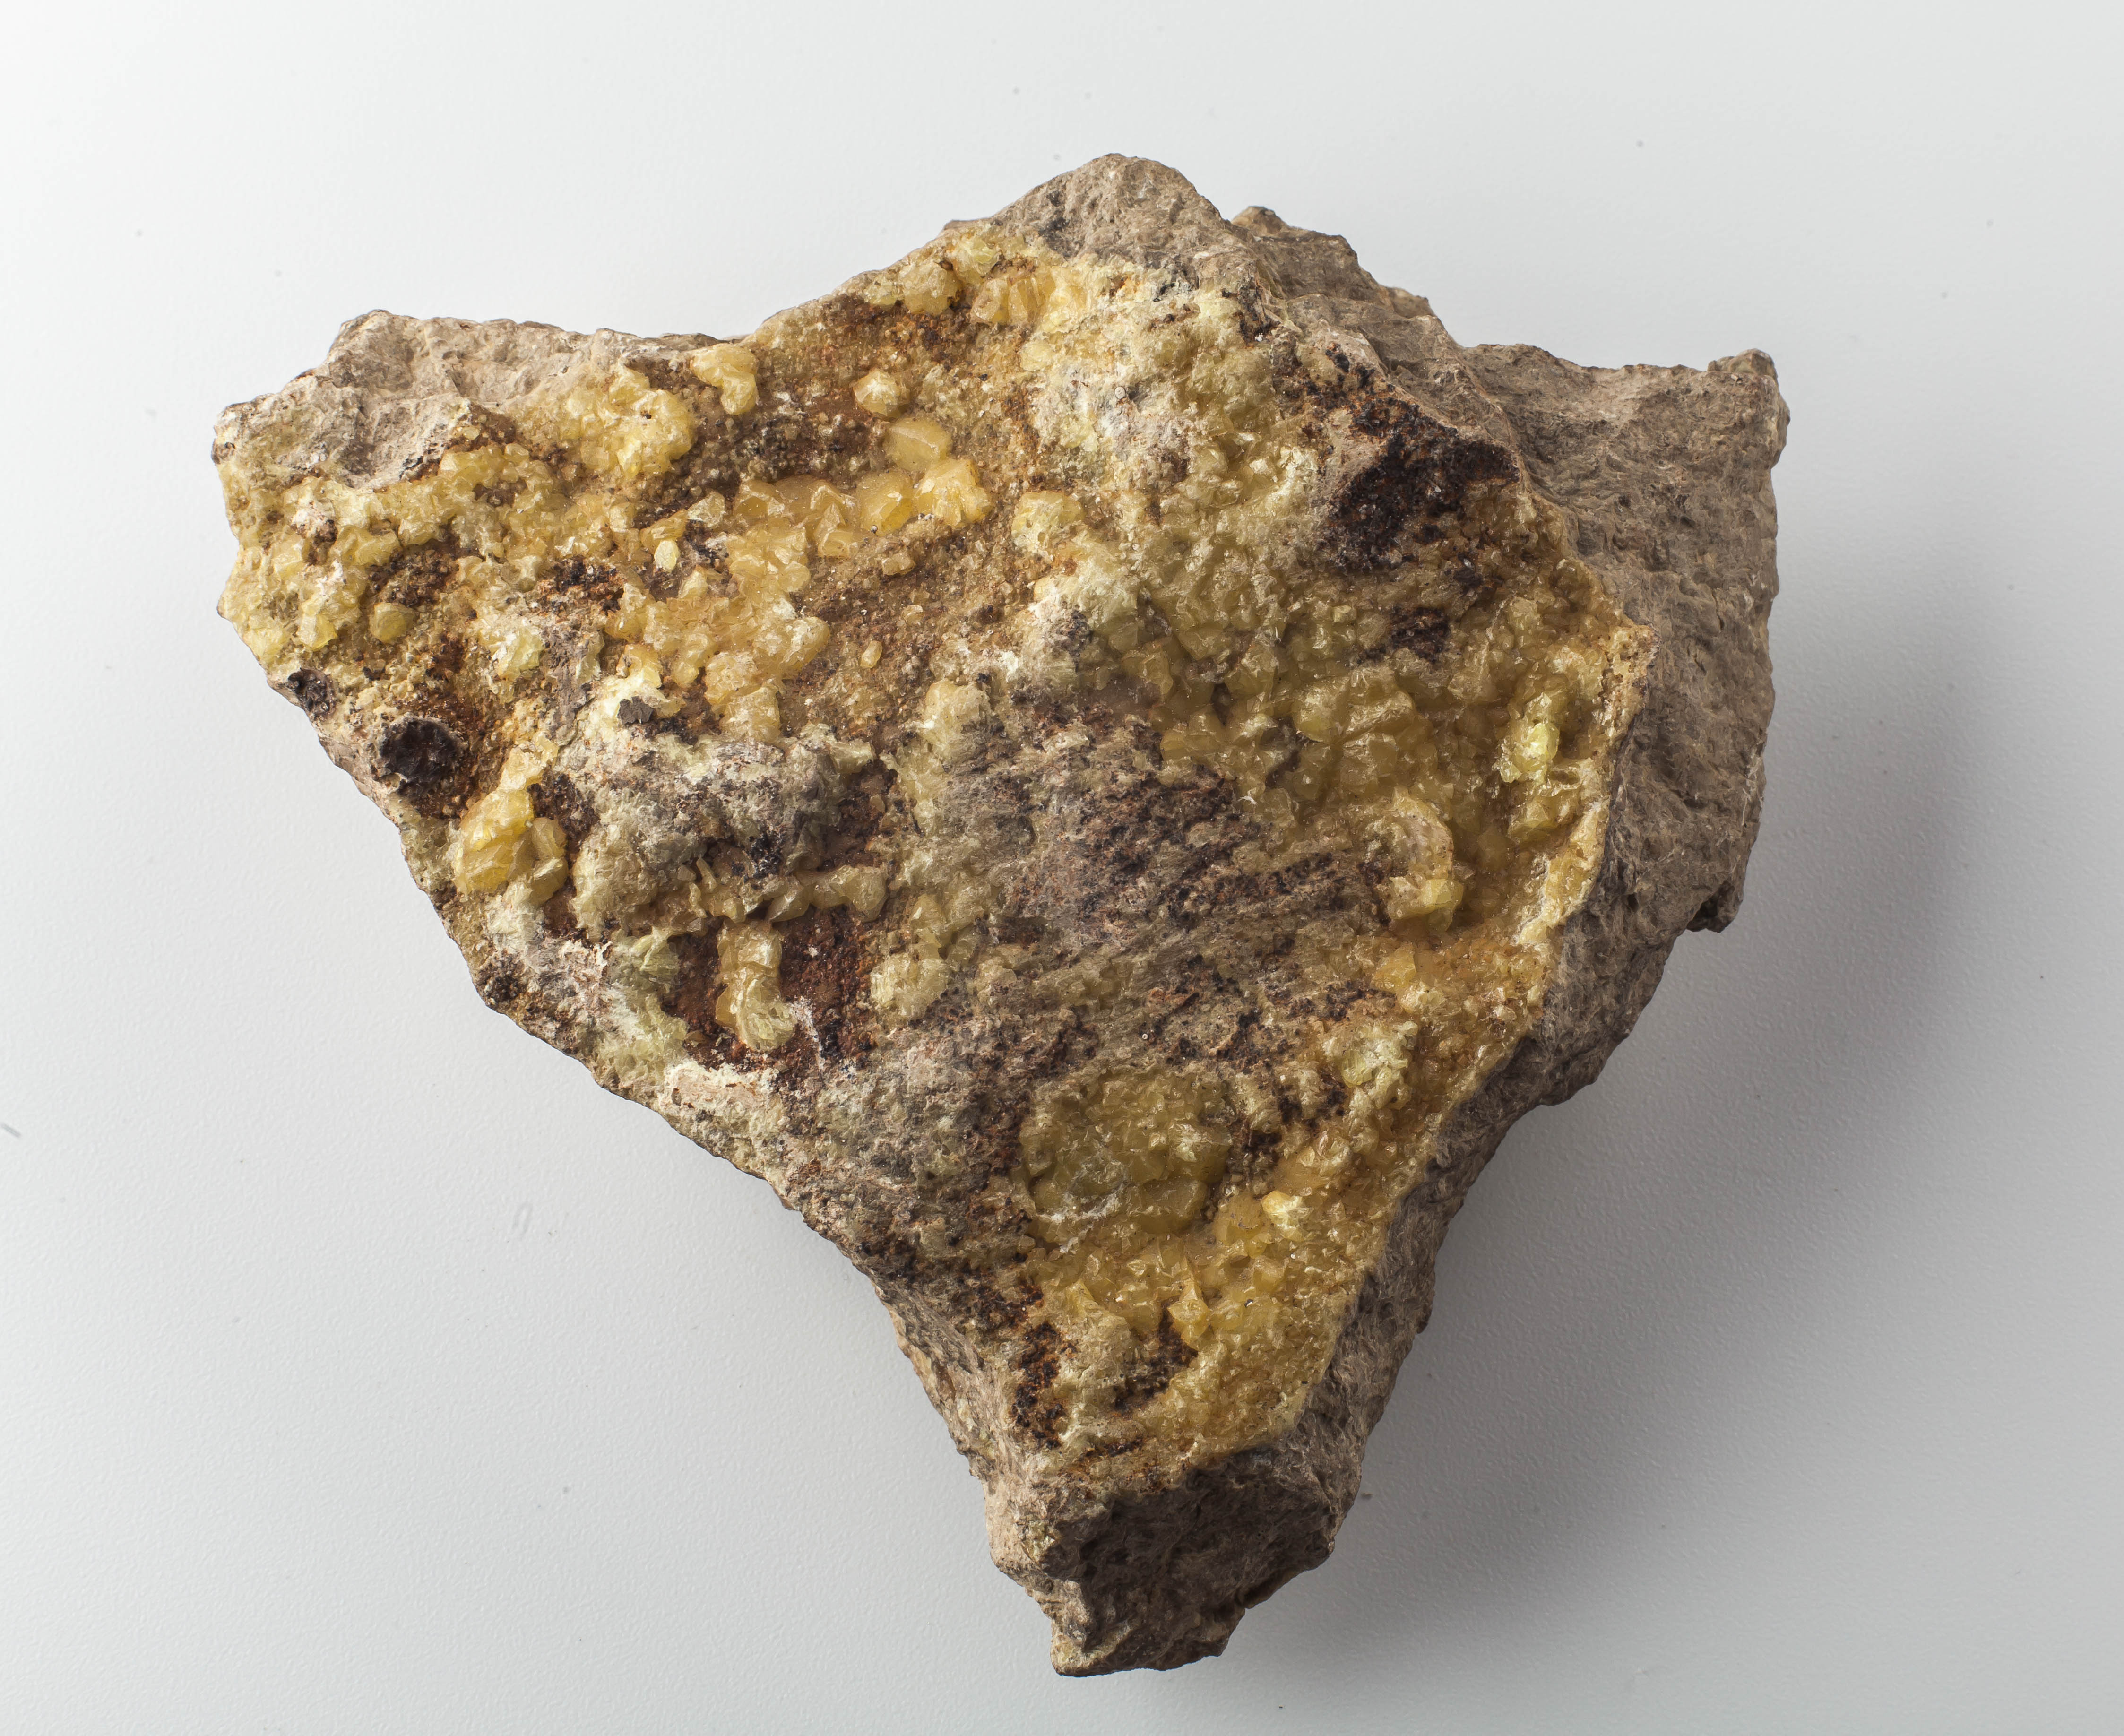 IES_SANISIDRO_MUSEO_Geologia_011